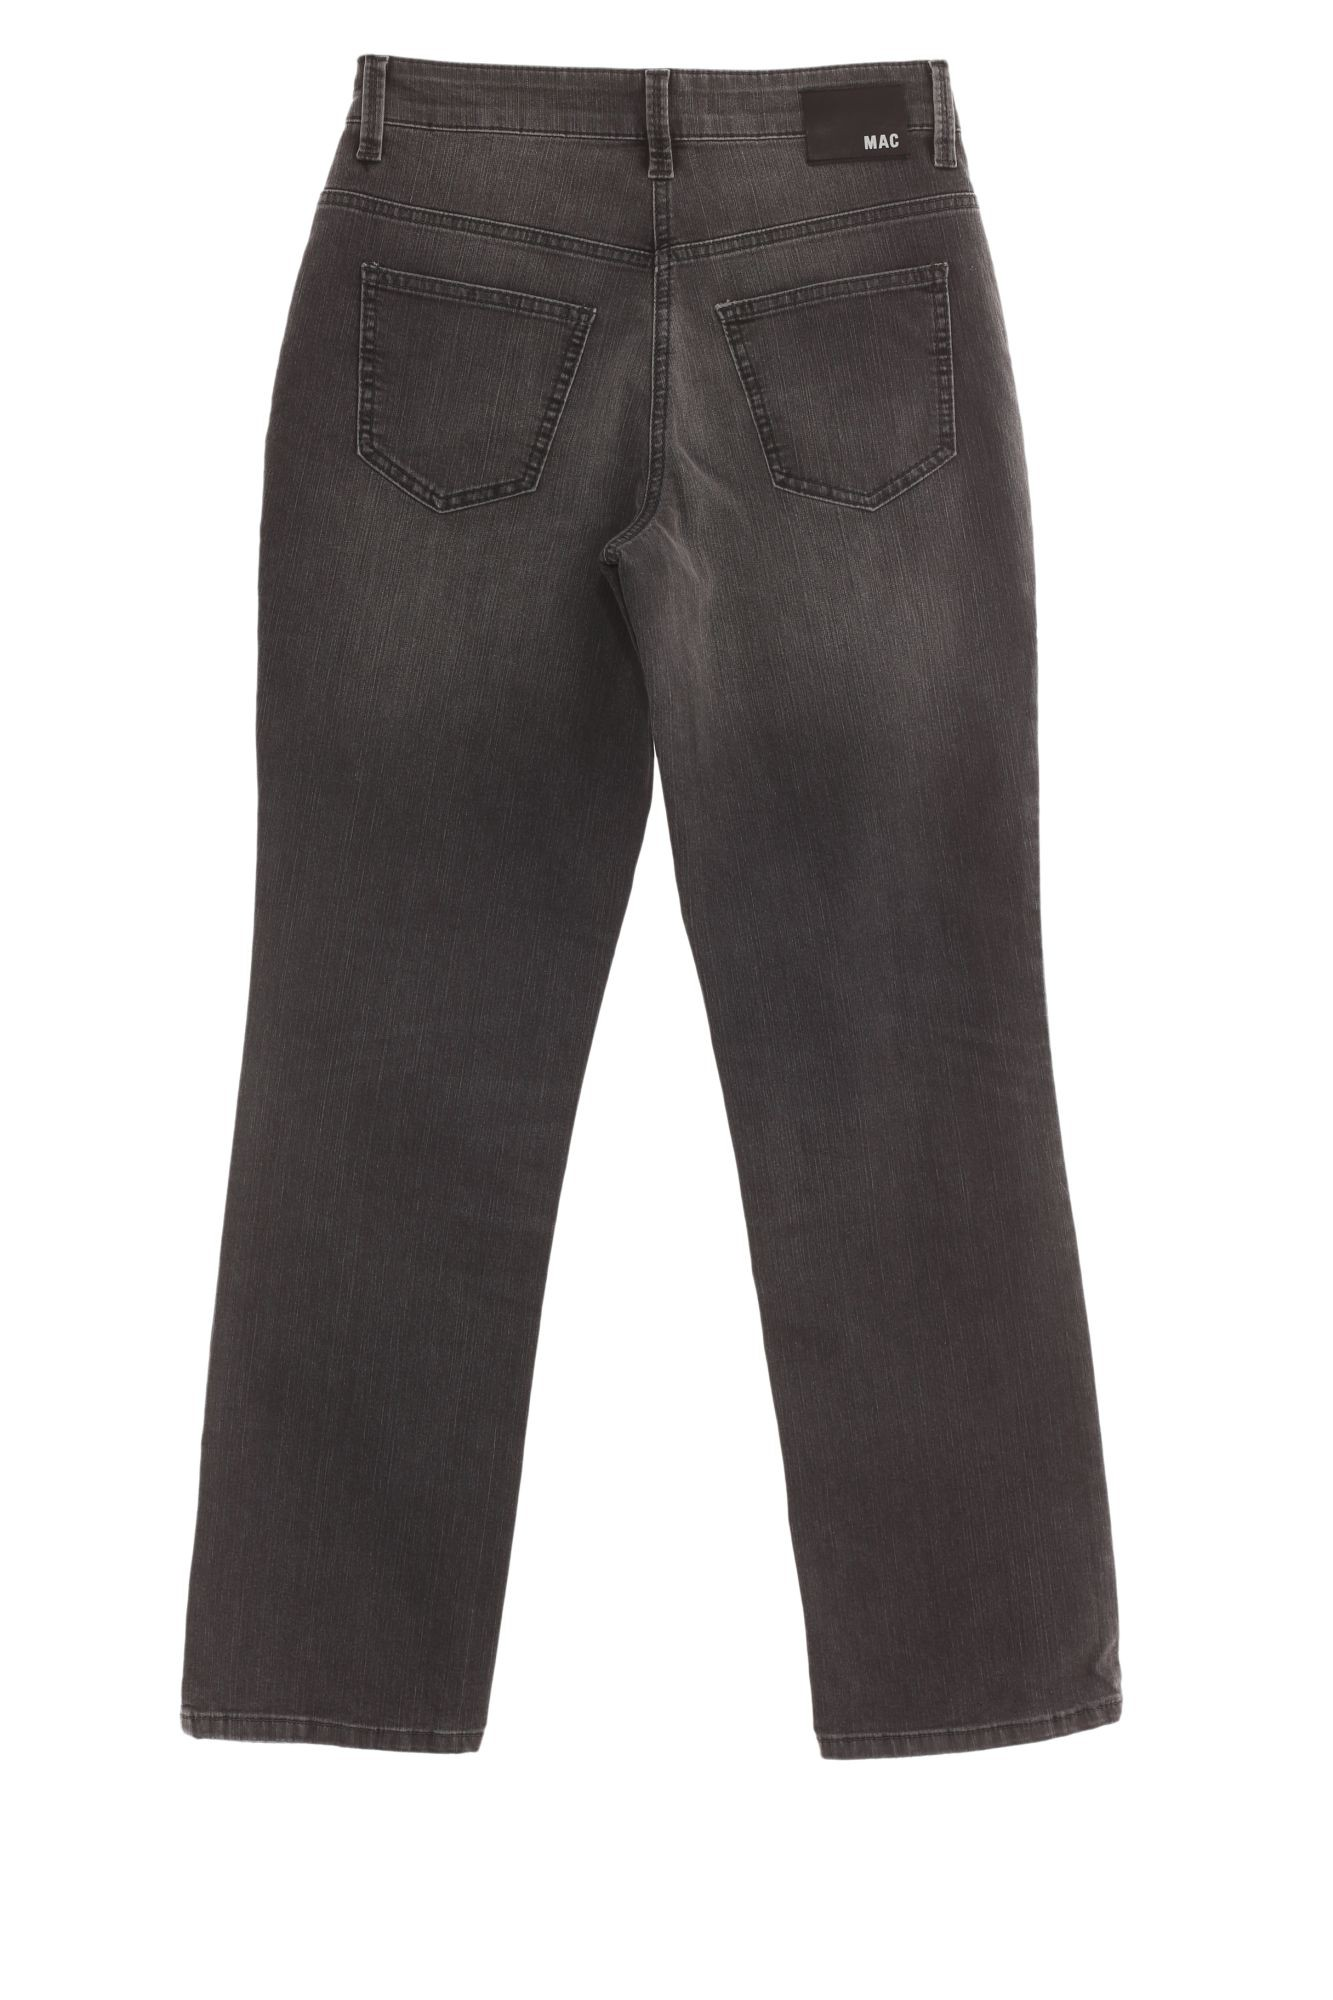 mac jeans melanie mac melanie jeans in light denim 32l. Black Bedroom Furniture Sets. Home Design Ideas